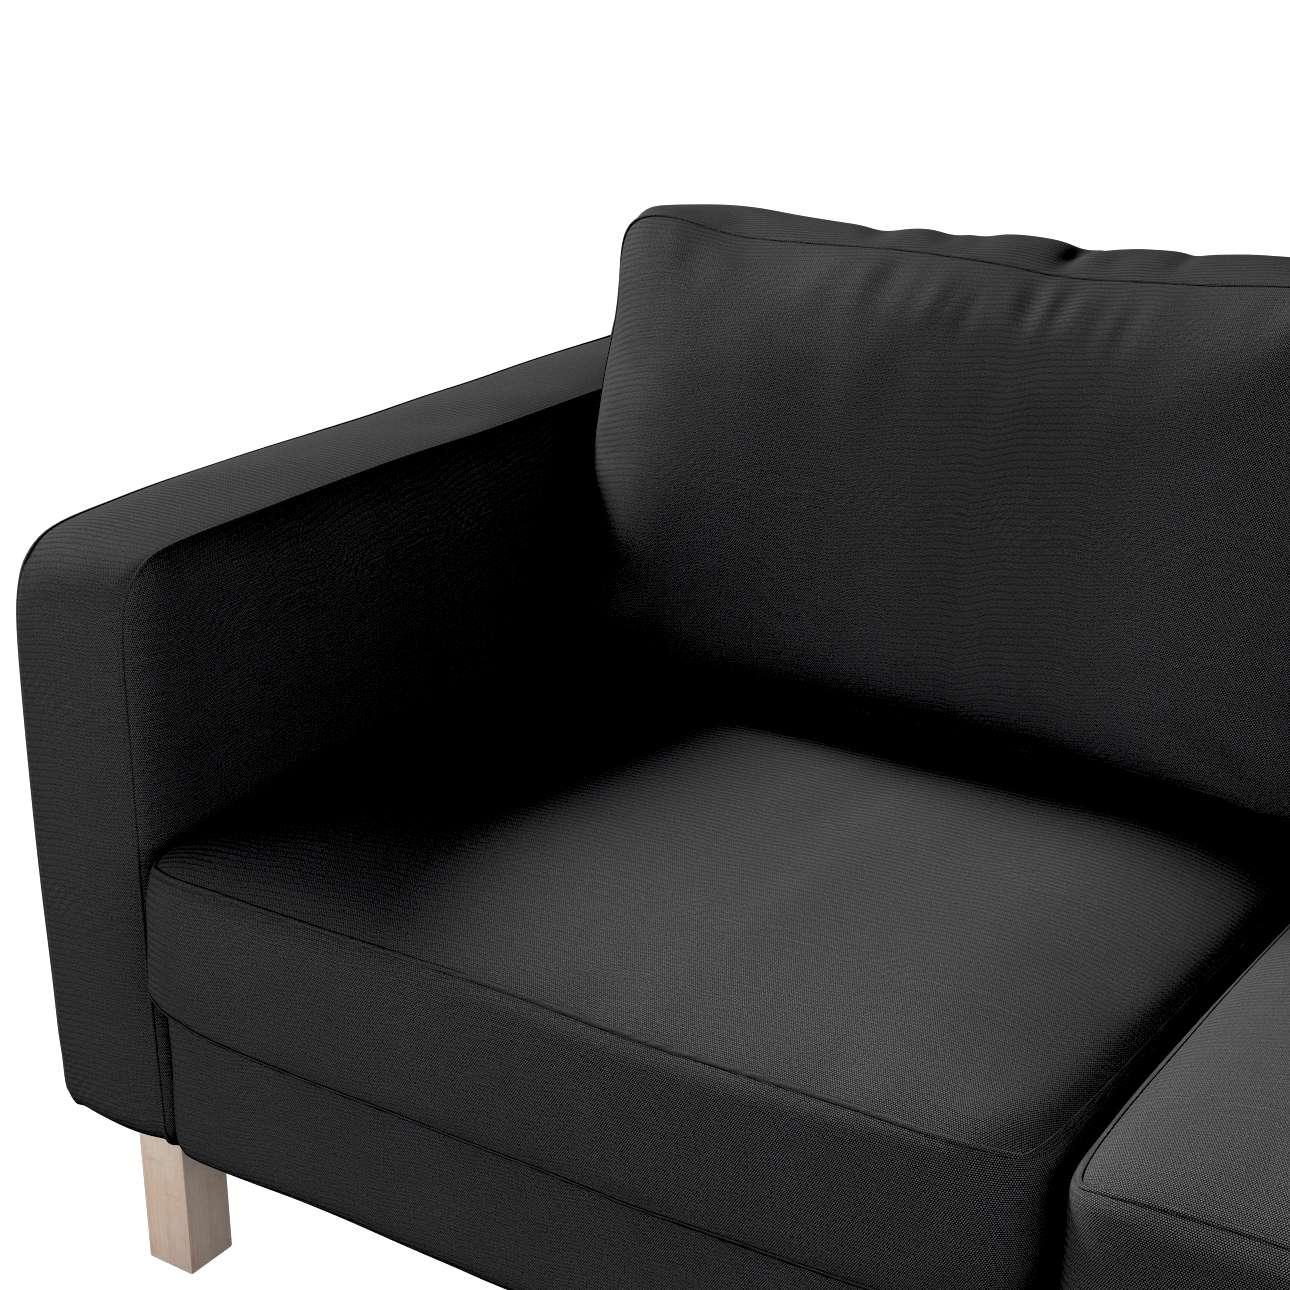 KARSLTAD dvivietės sofos užvalkalas kolekcijoje Etna , audinys: 705-00